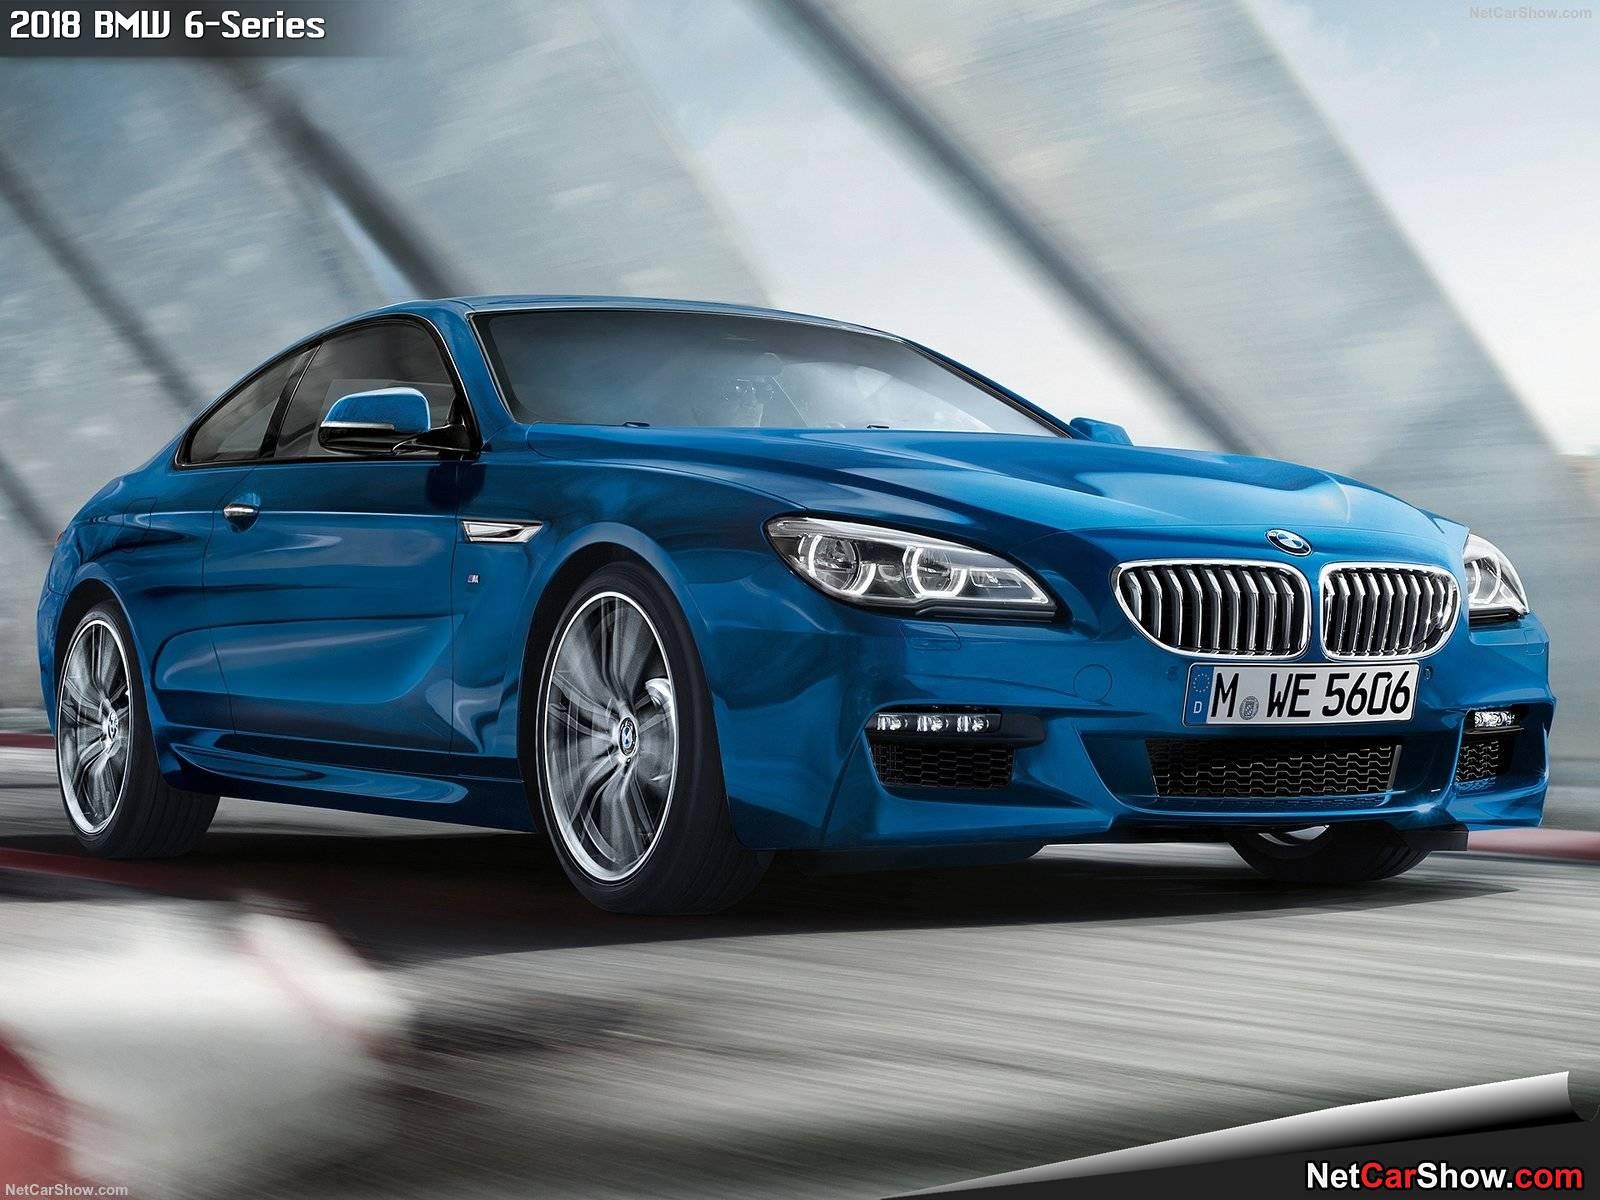 BMW-6-Series-2018-1600-02